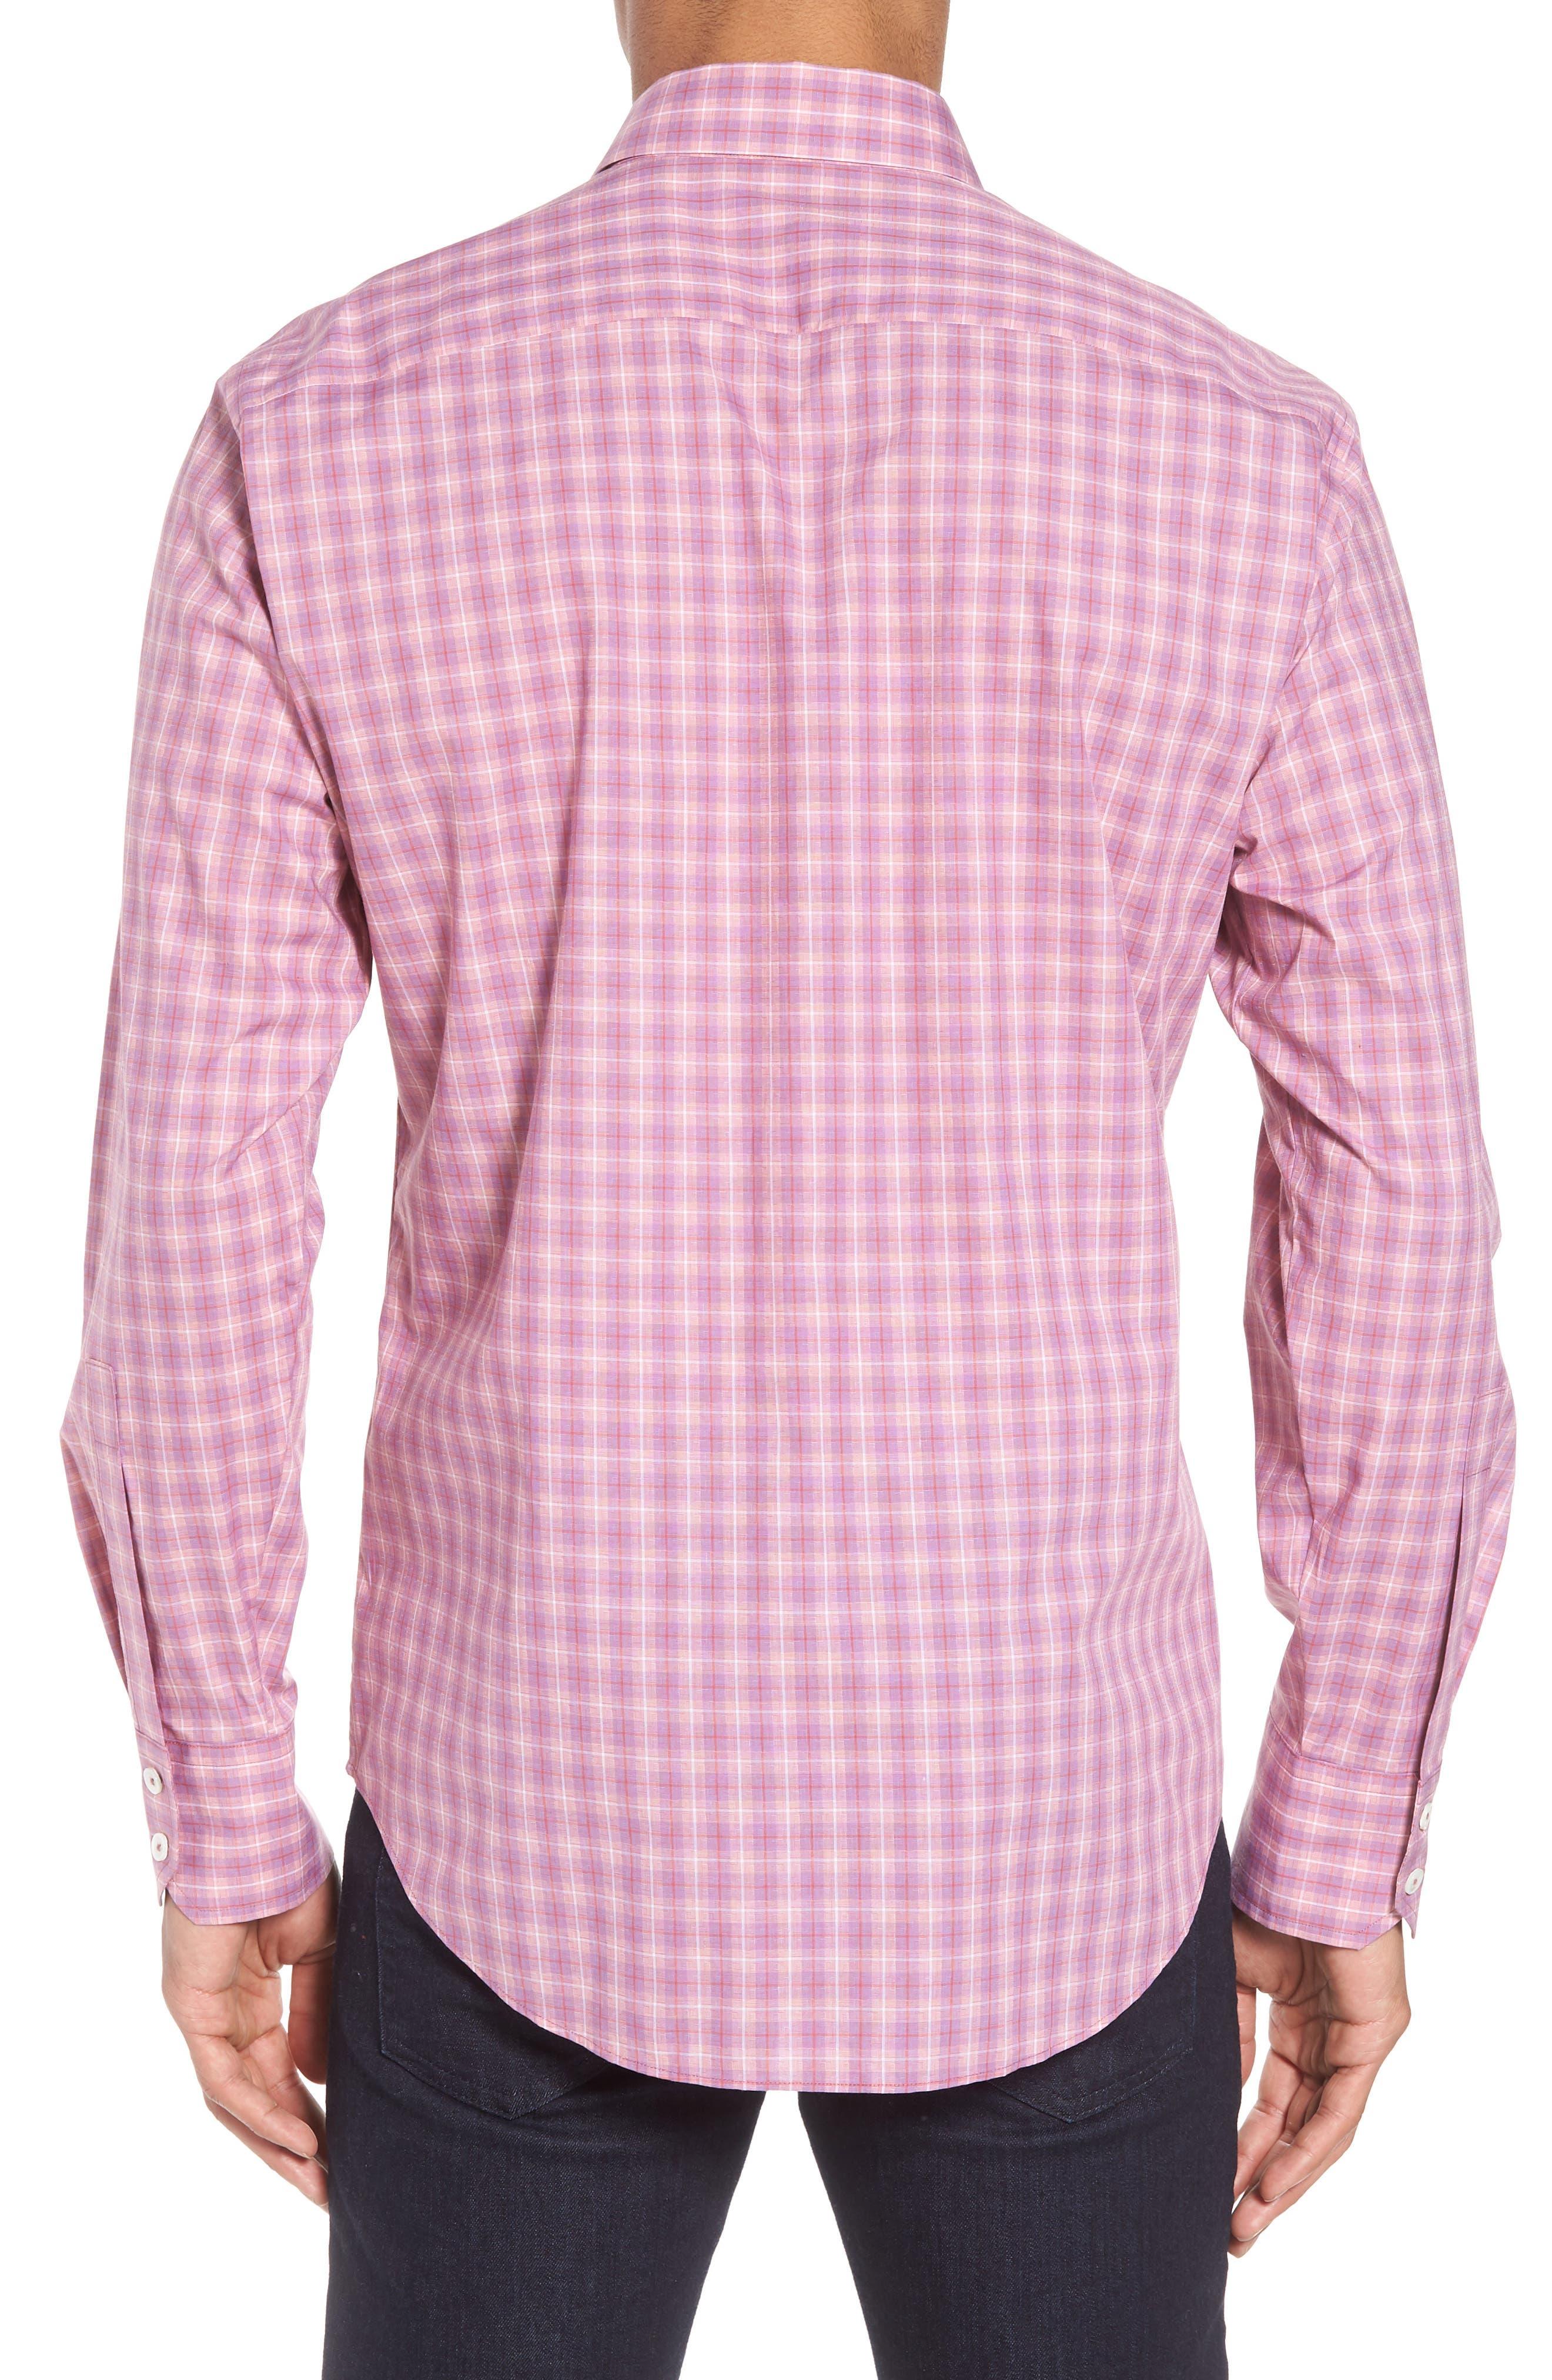 ZACHARY PRELL, Duran Regular Fit Sport Shirt, Alternate thumbnail 2, color, PINK